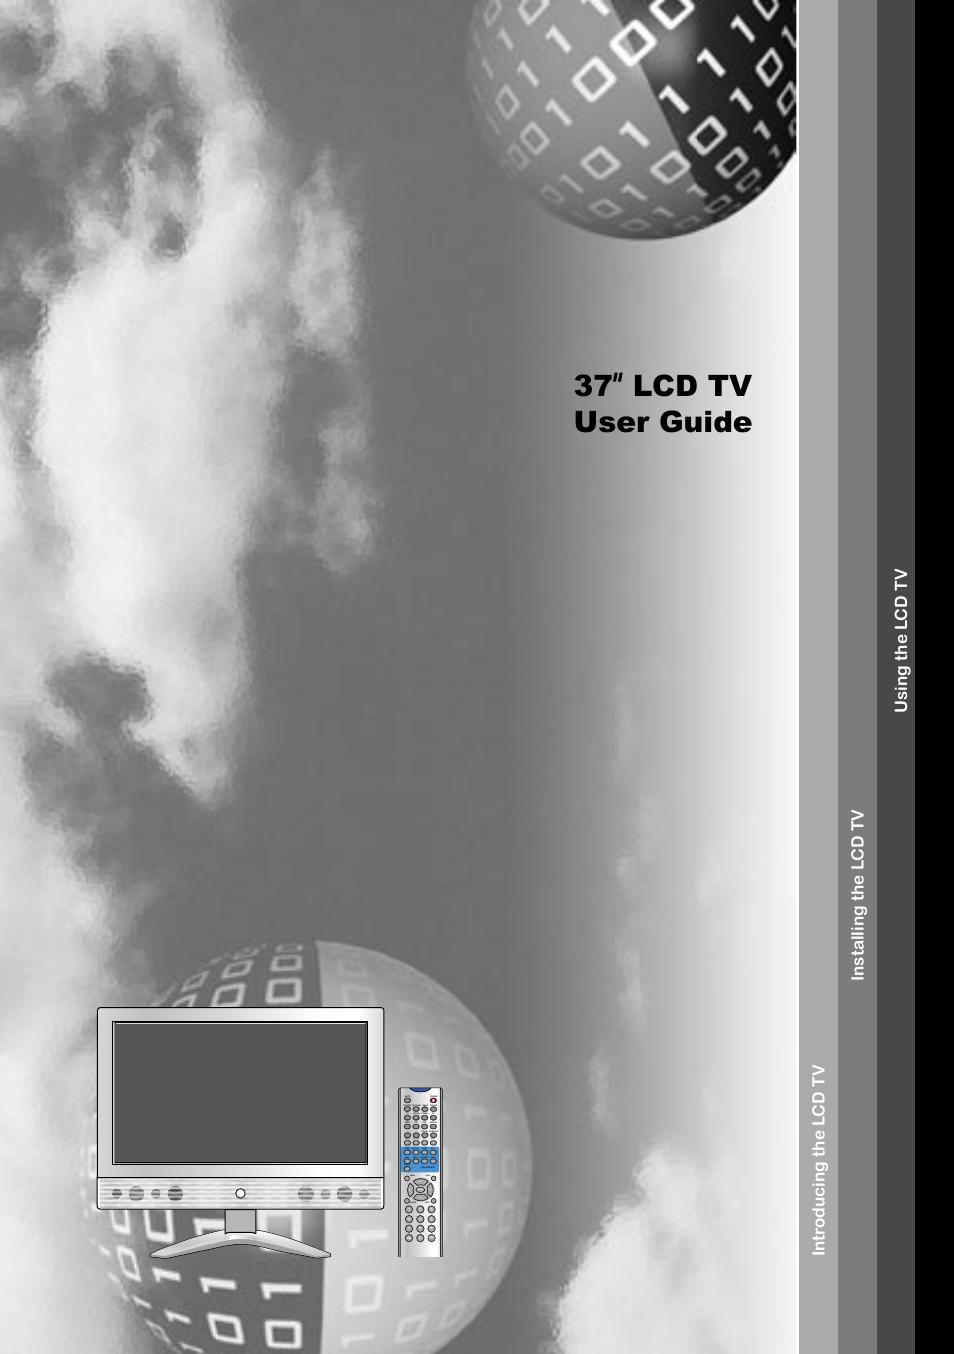 emprex hd 3701 user manual 52 pages rh manualsdir com Infinity PRV250 Manual Emprex Monitor Computer